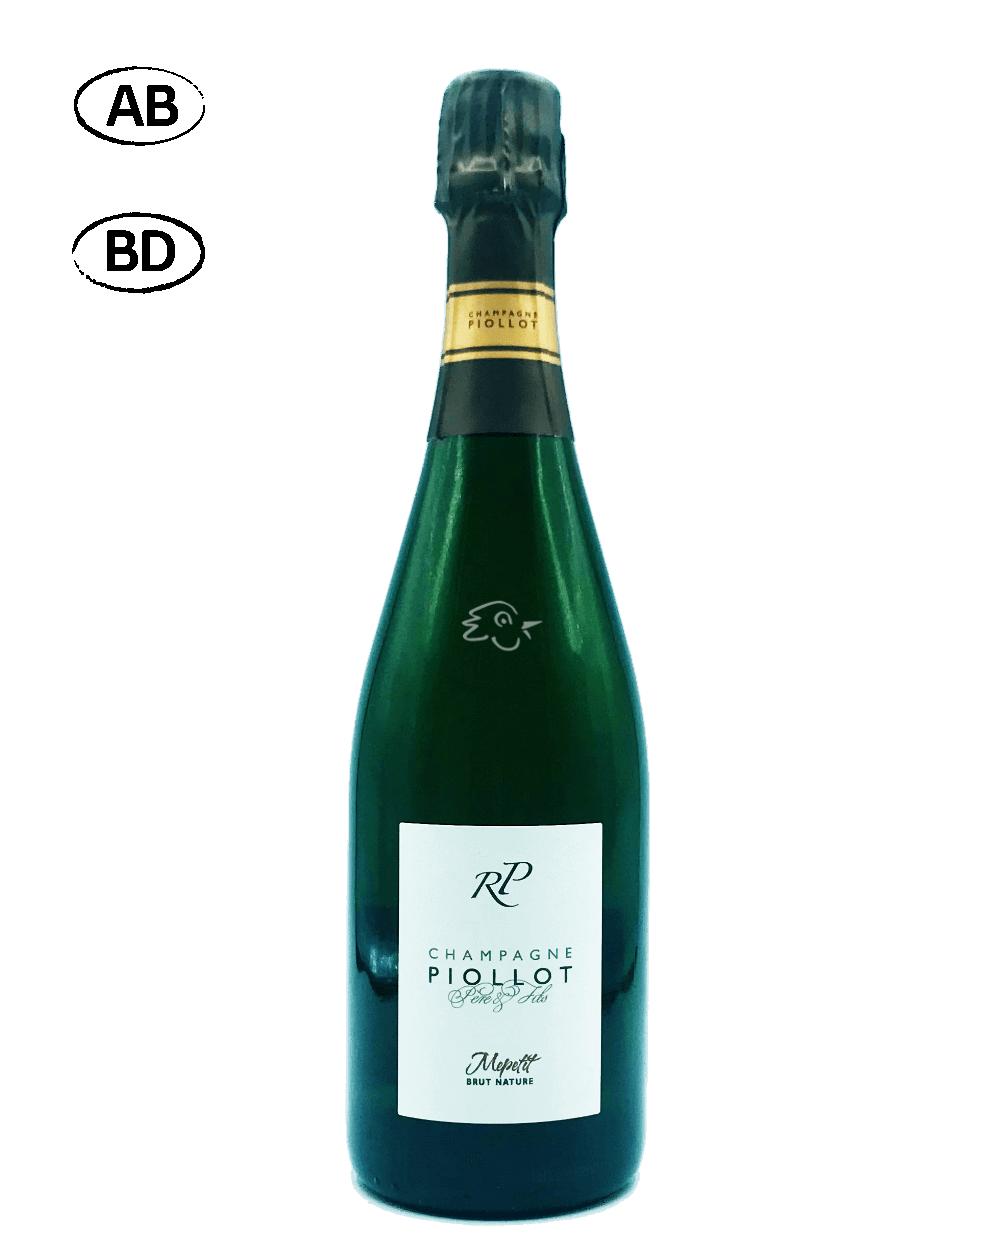 Champagne Piollot - Pinot Meunier Mepetit 2016 - Avintures